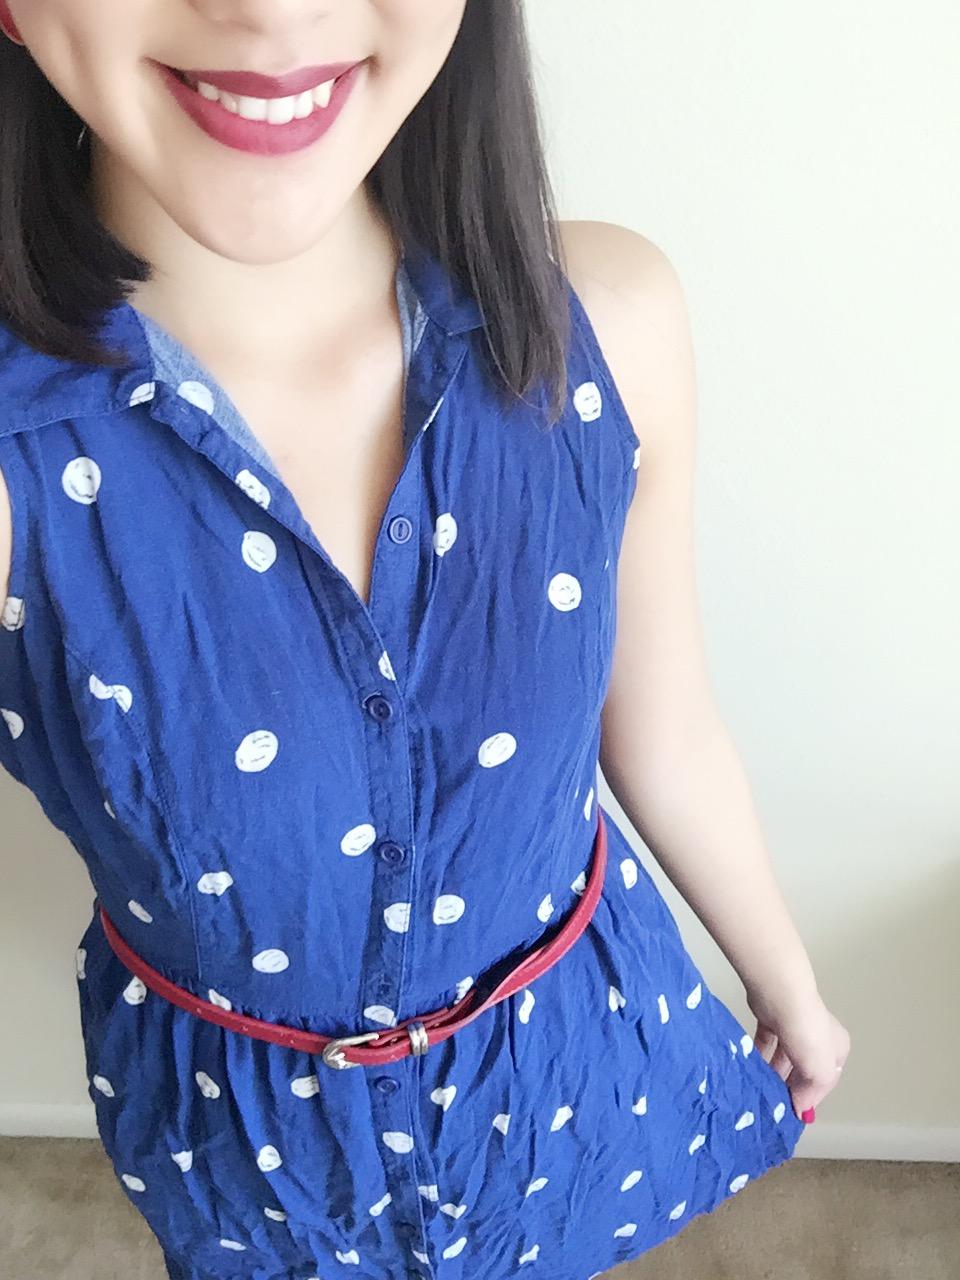 Dress: H&M / Belt: Target / Earrings: F21 / Shoes: Payless / Scarf: Gift / Lipstick: Colour Pop